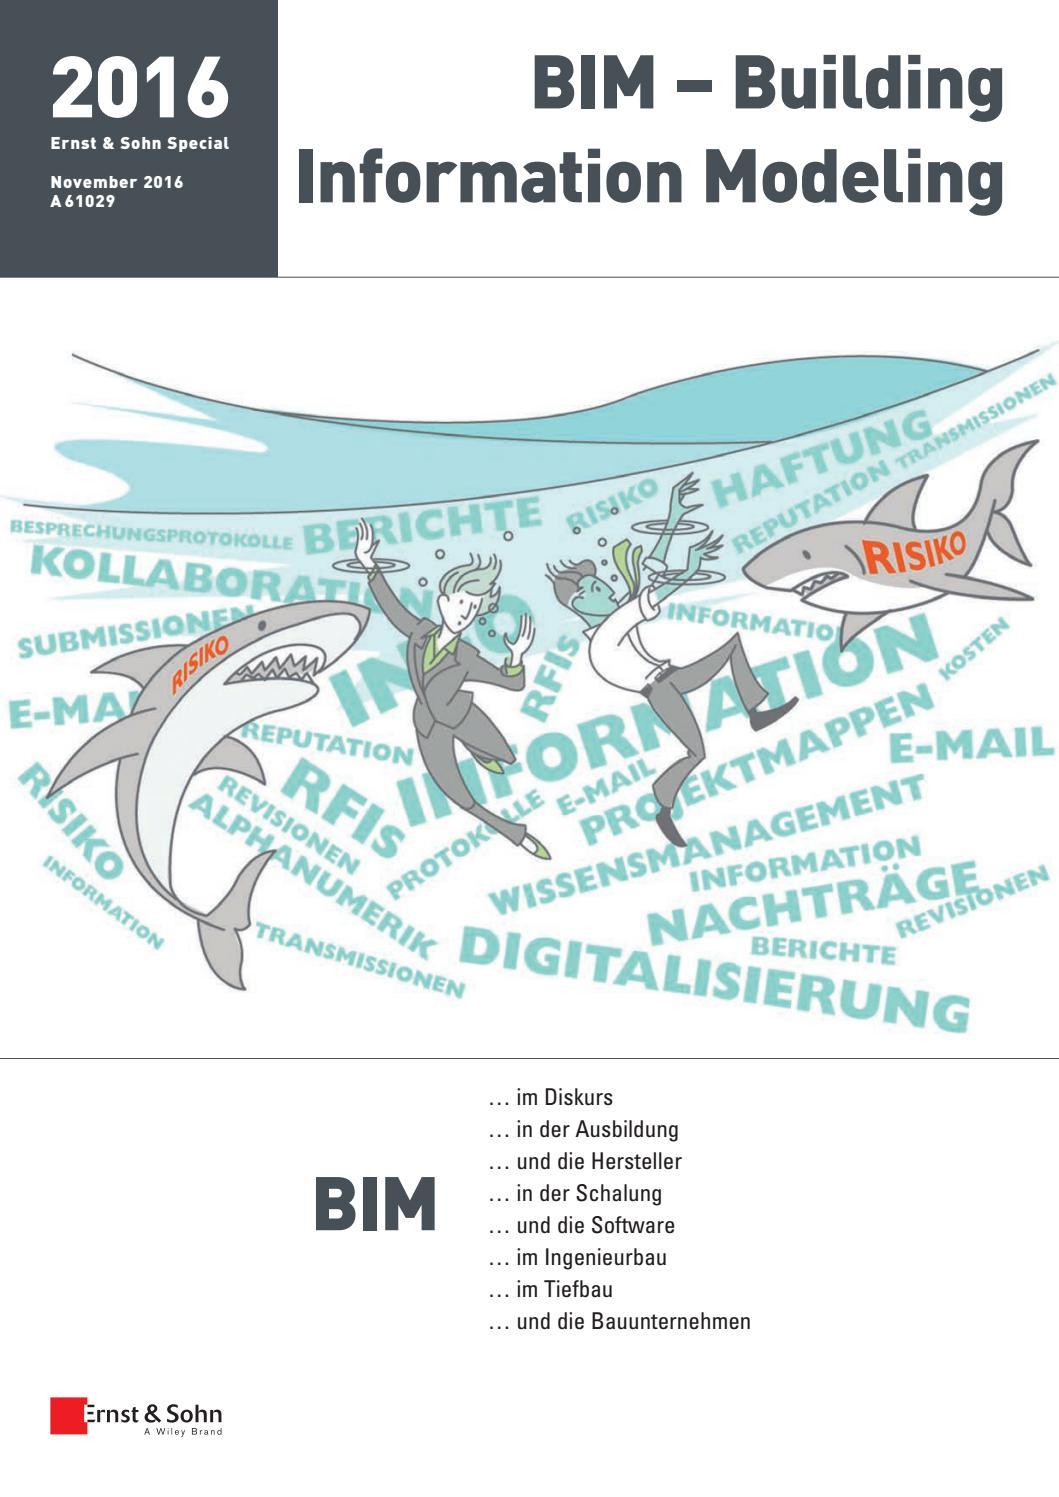 Ernst & Sohn Sonderheft BIM 2016 by Ernst & Sohn - issuu